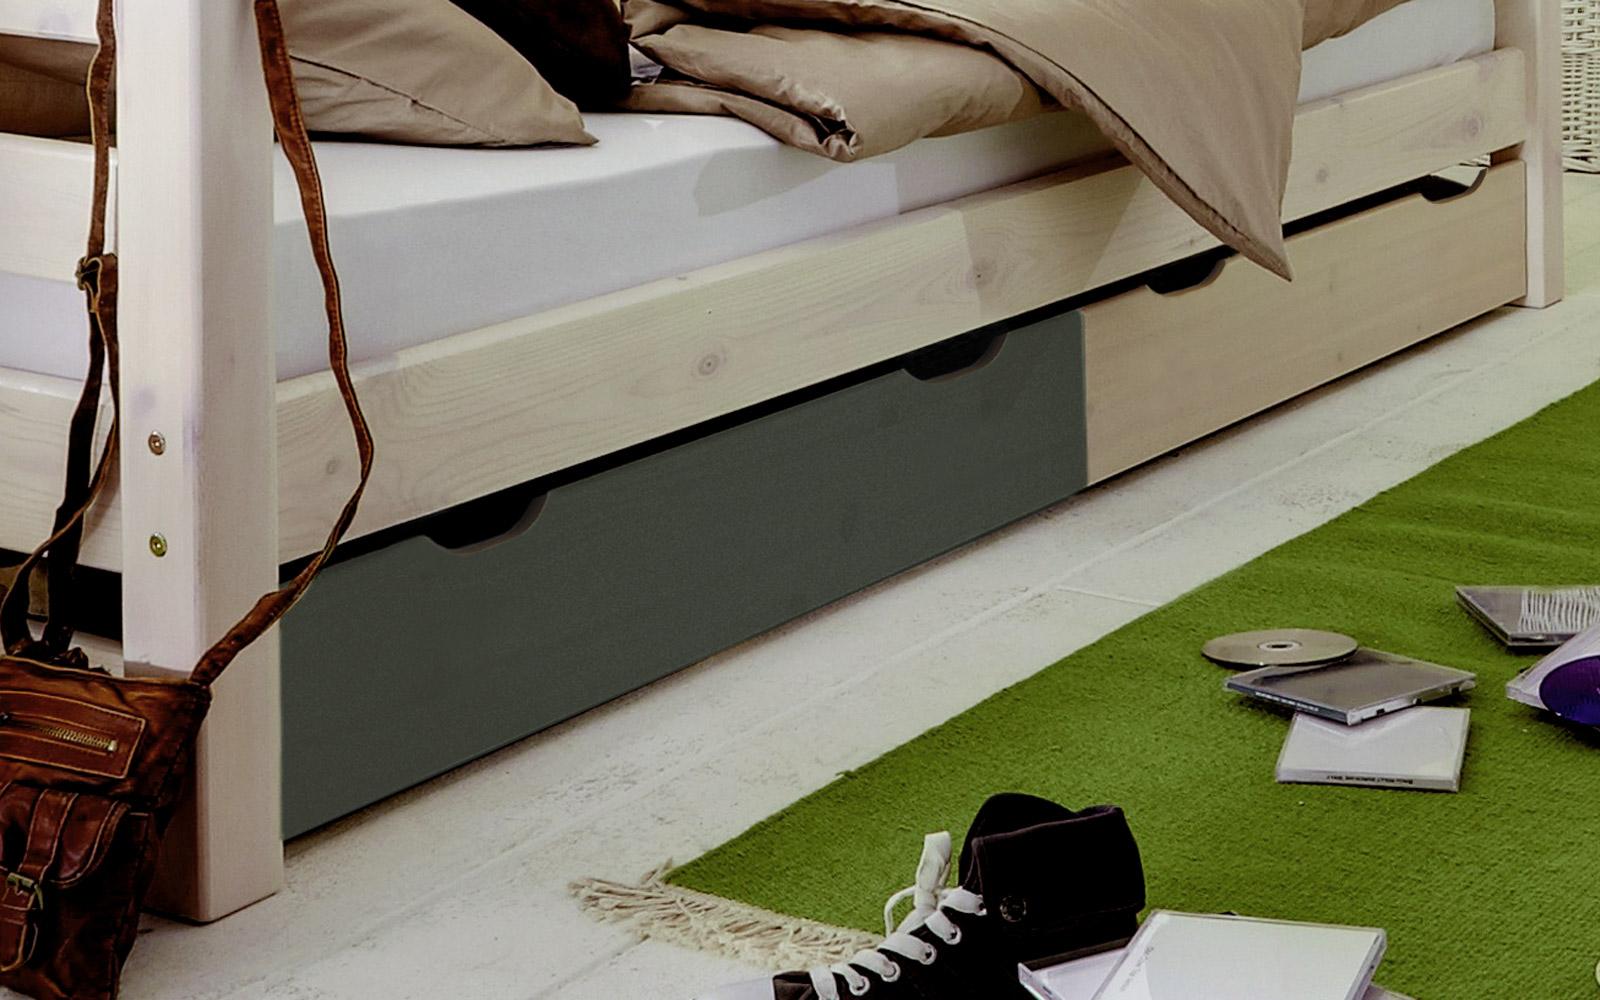 kinderbett mit schubladen aus kiefer kids paradise. Black Bedroom Furniture Sets. Home Design Ideas